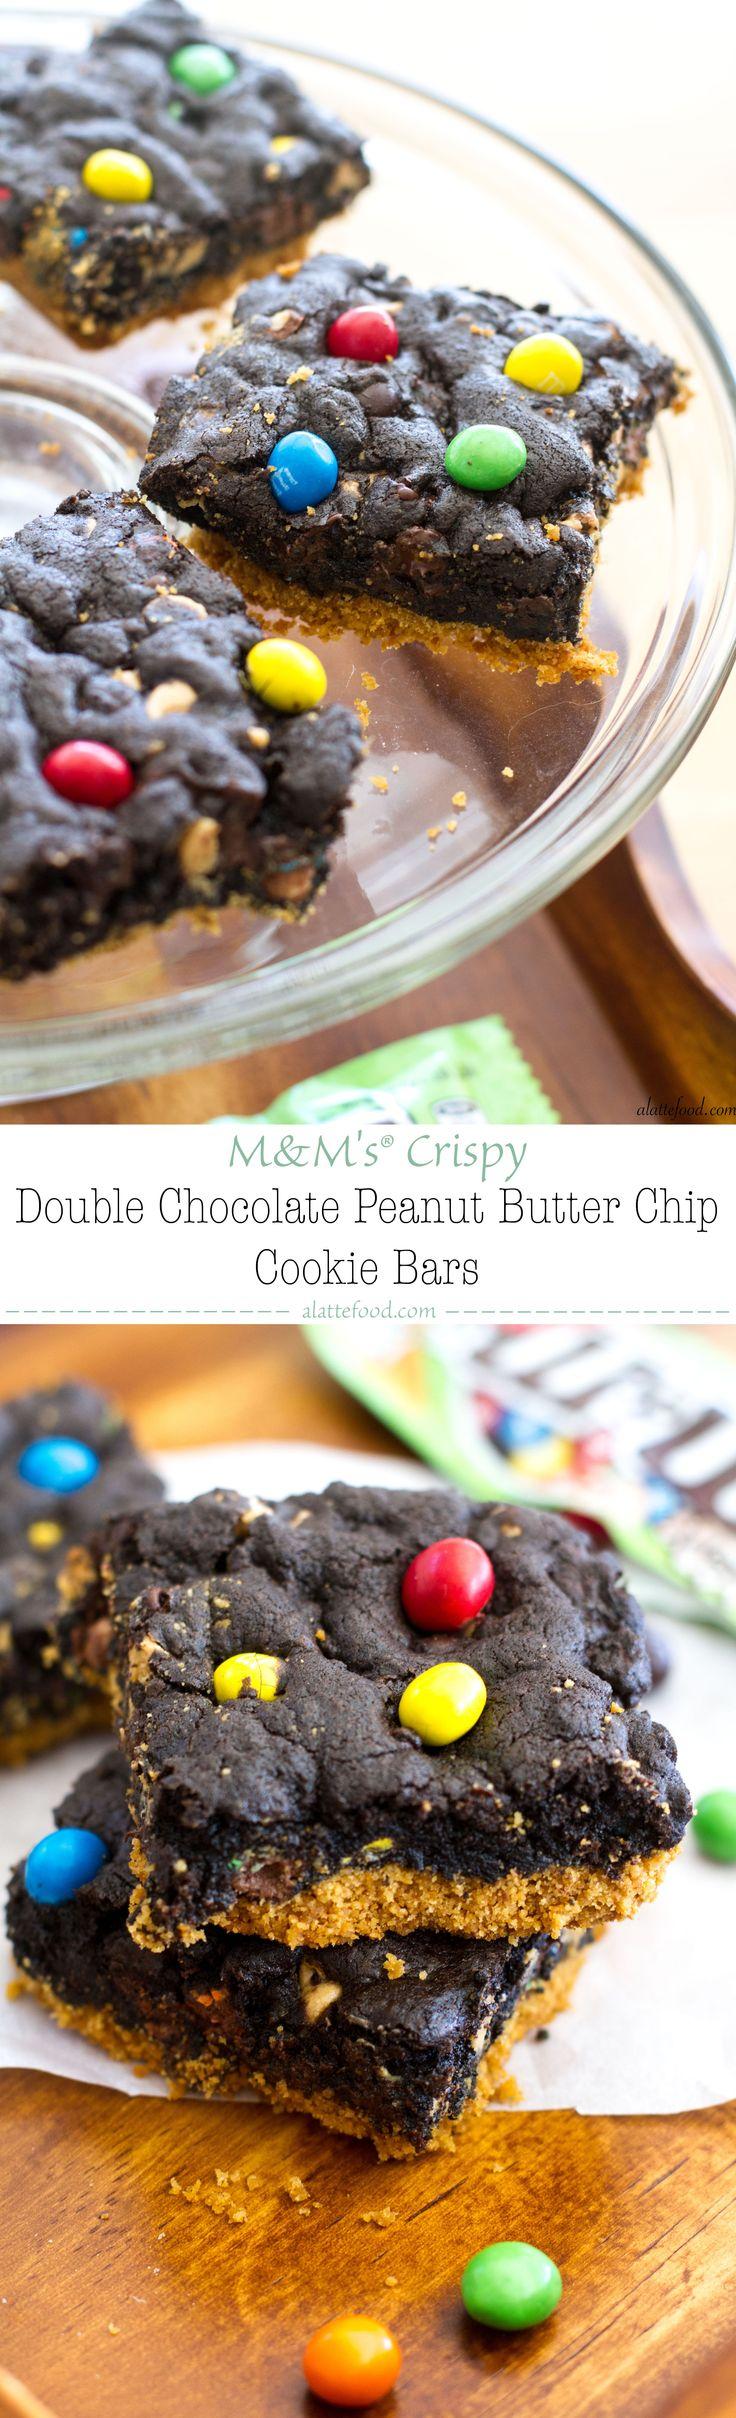 MandM's® Crispy Double Chocolate Peanut Butter Chip Cookie Bars   A Latte Food